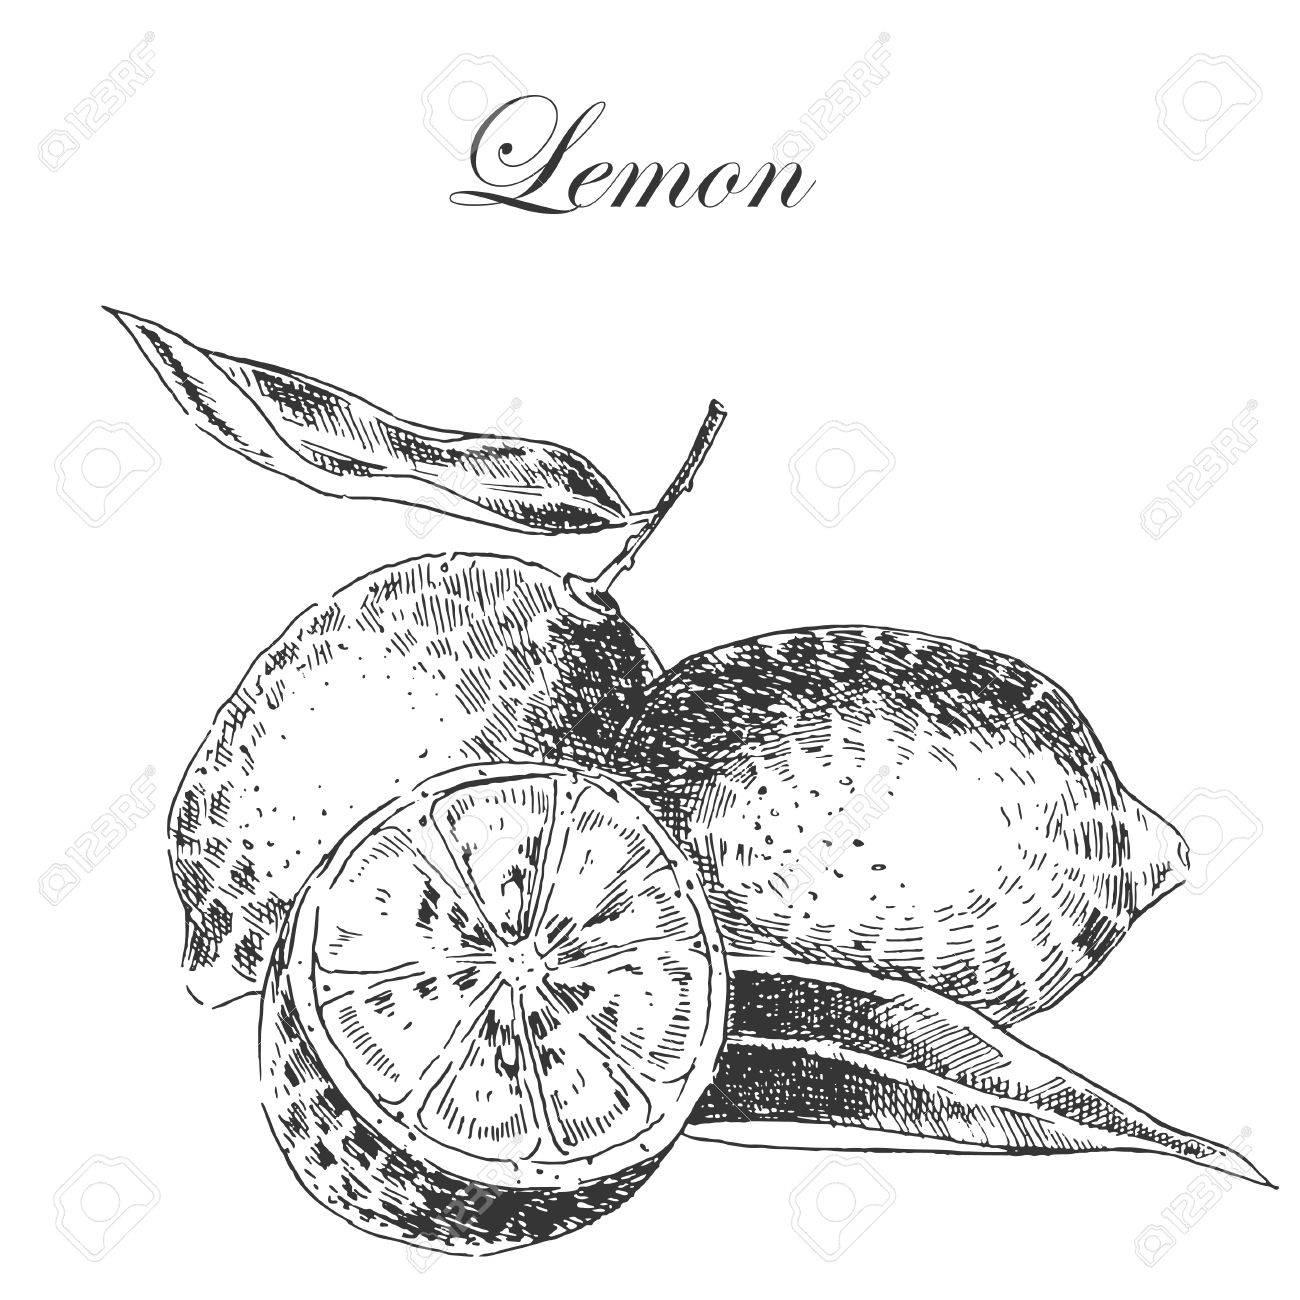 1300x1300 Vector Lemon Citrus Hand Drawn Sketch In Ink And Pencil. Retro